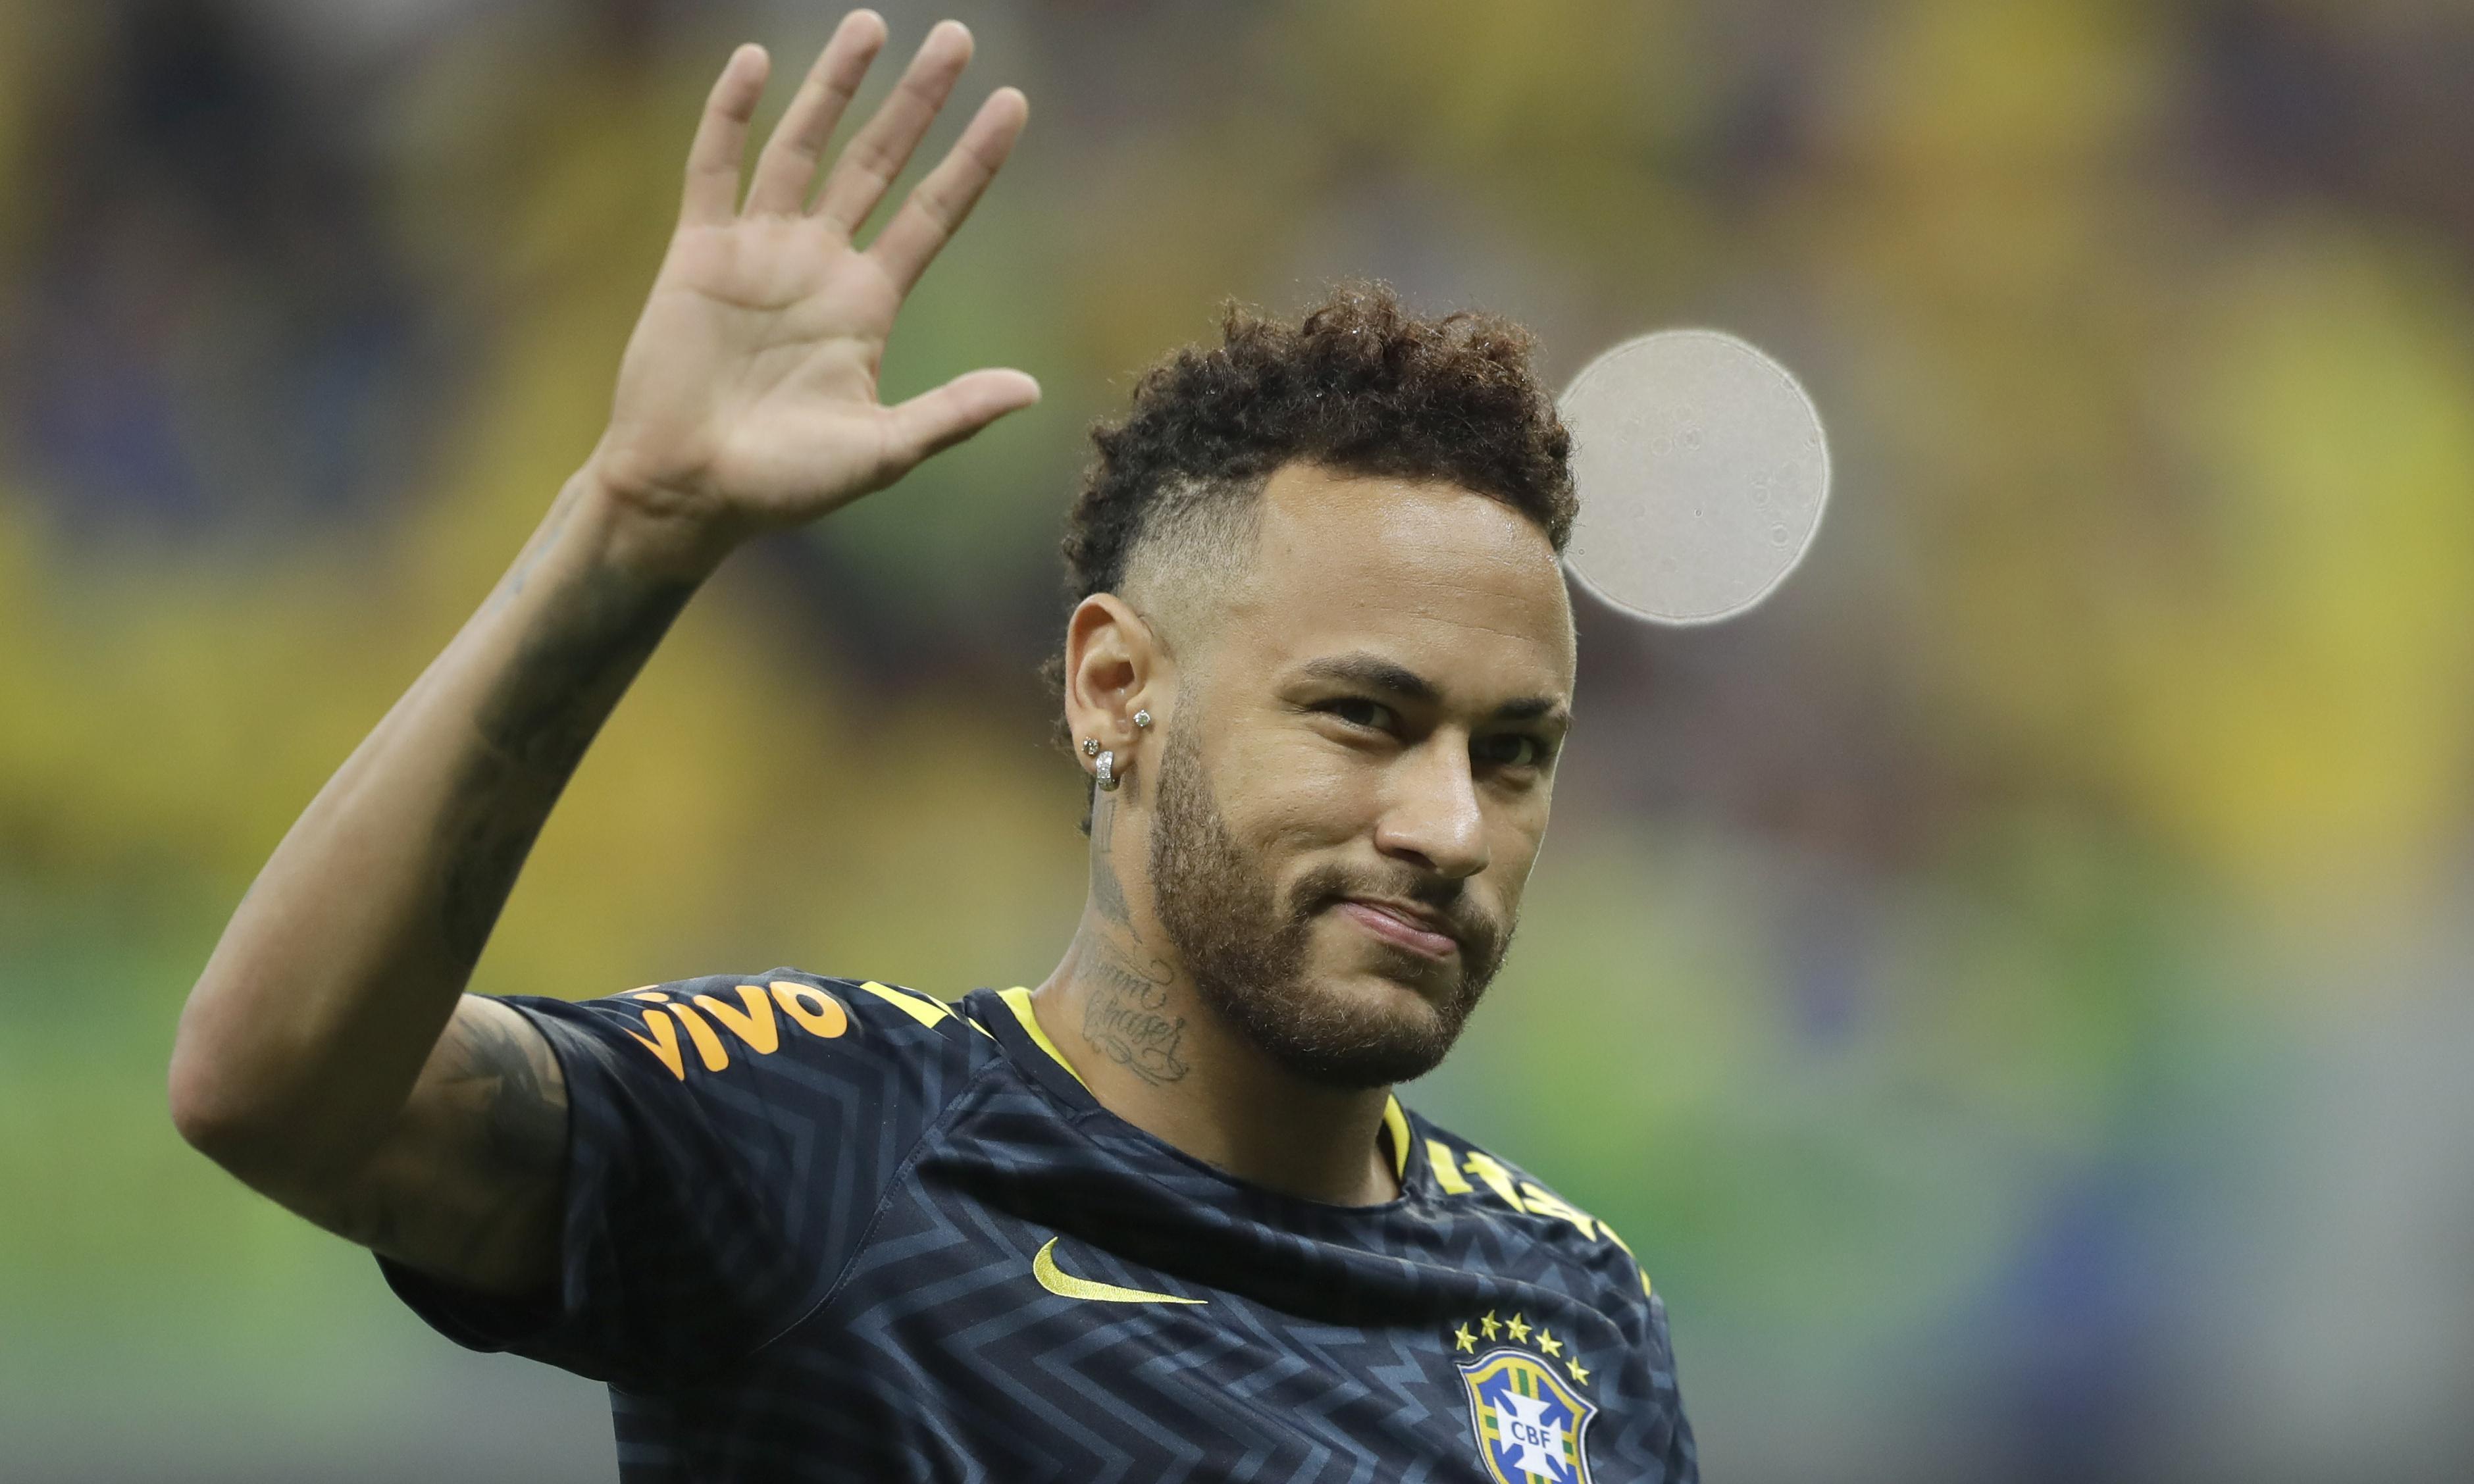 Football transfer rumours: Neymar to leave PSG?